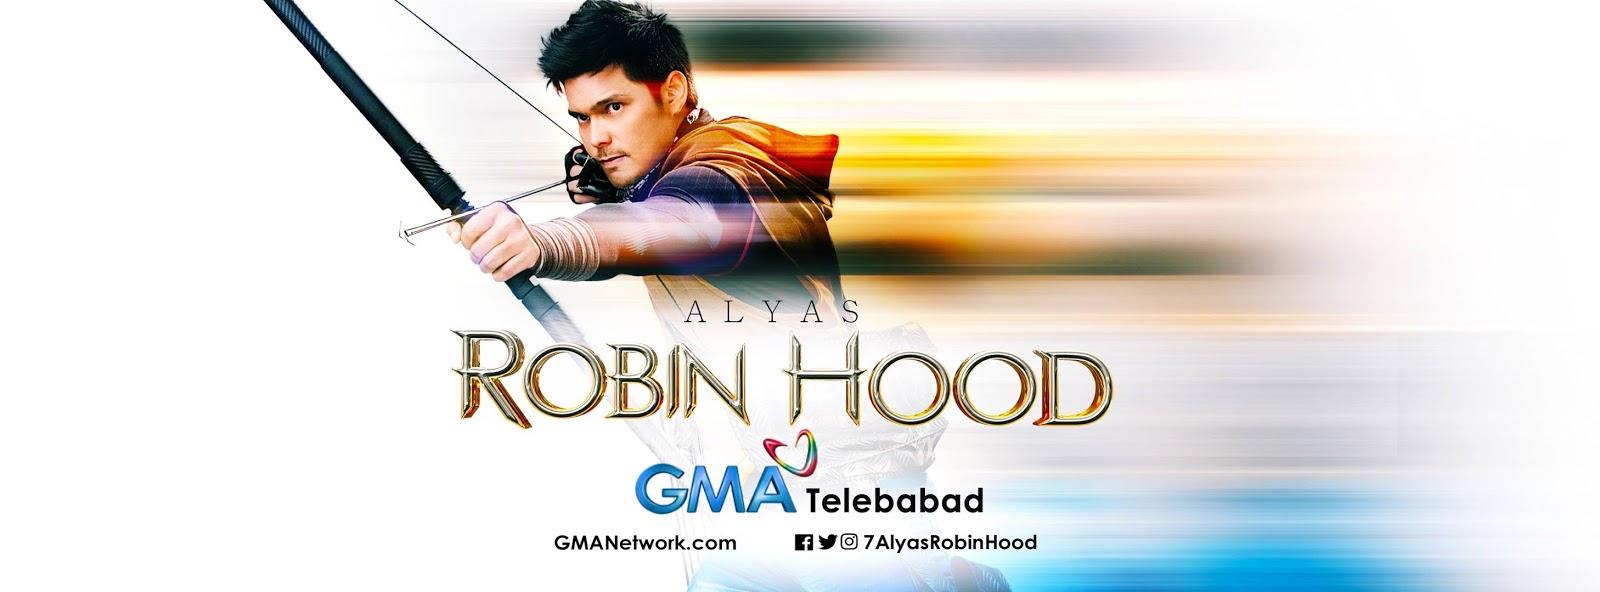 Alyas Robin Hood August 31 2017